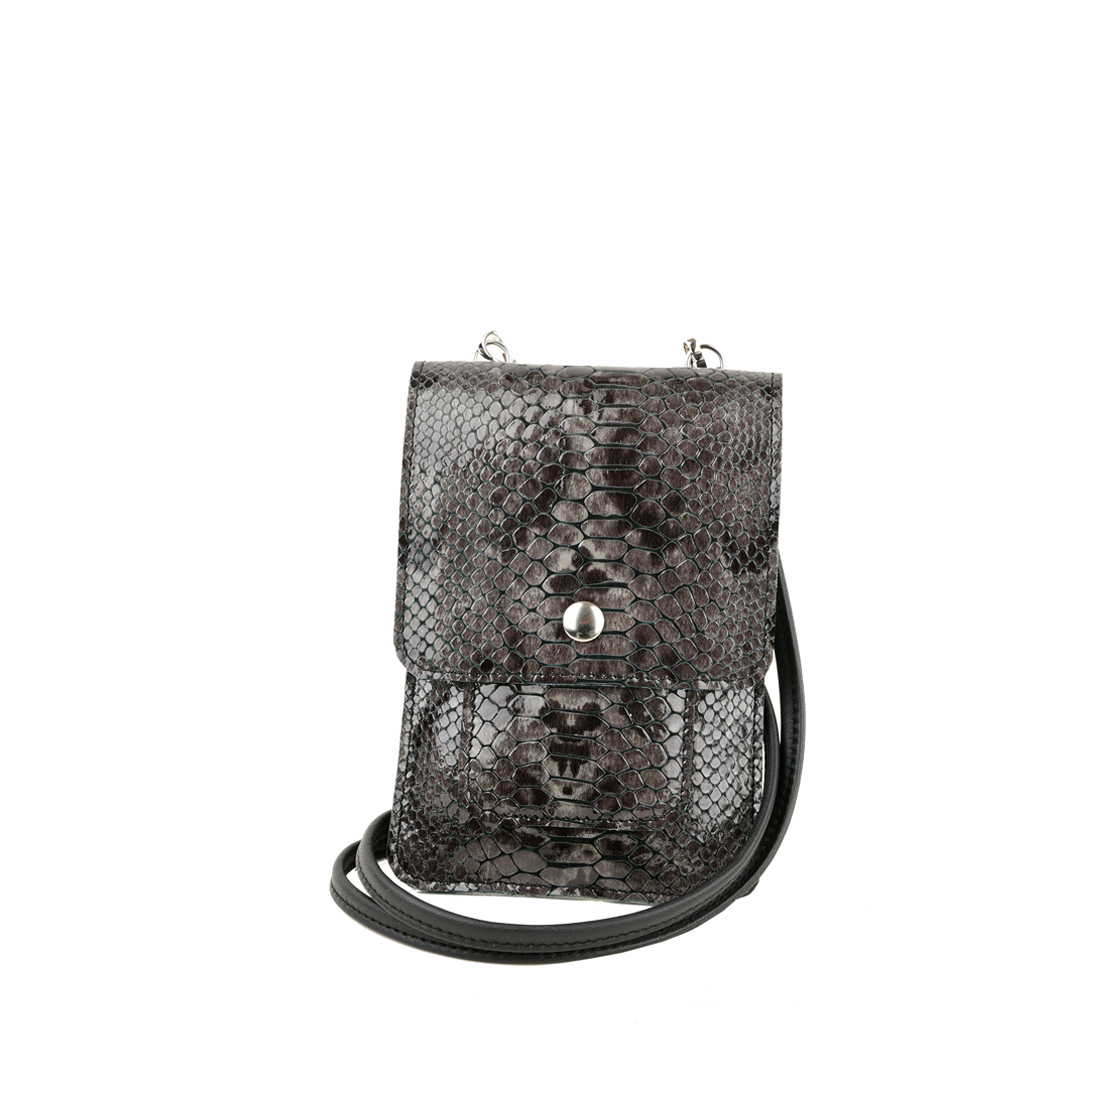 Zoe grey python print phone pouch